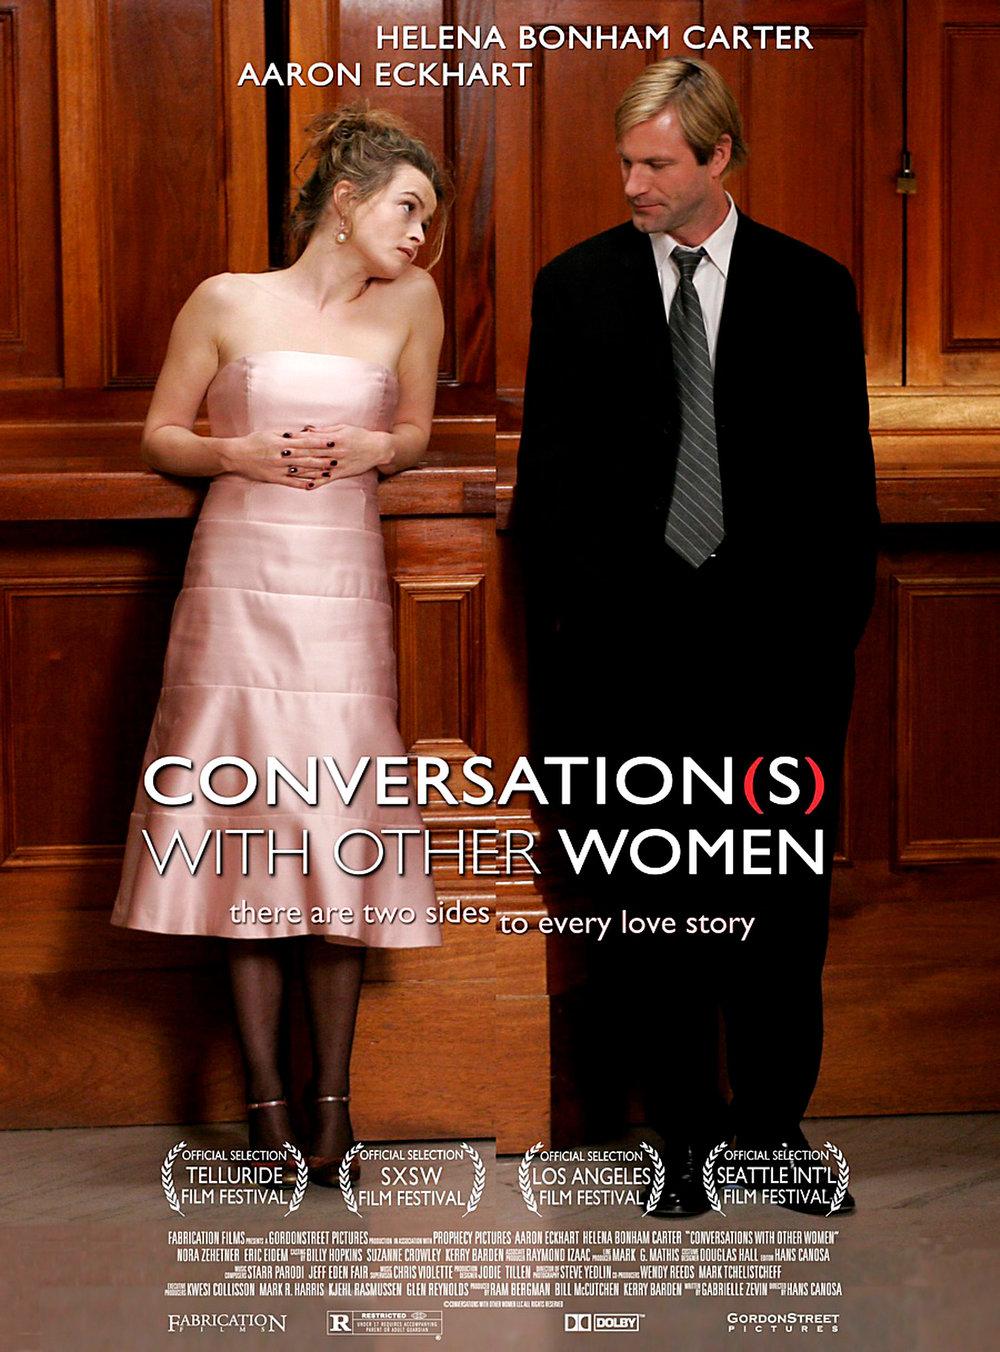 Films_ConversationsOtherWomen_0001.jpg